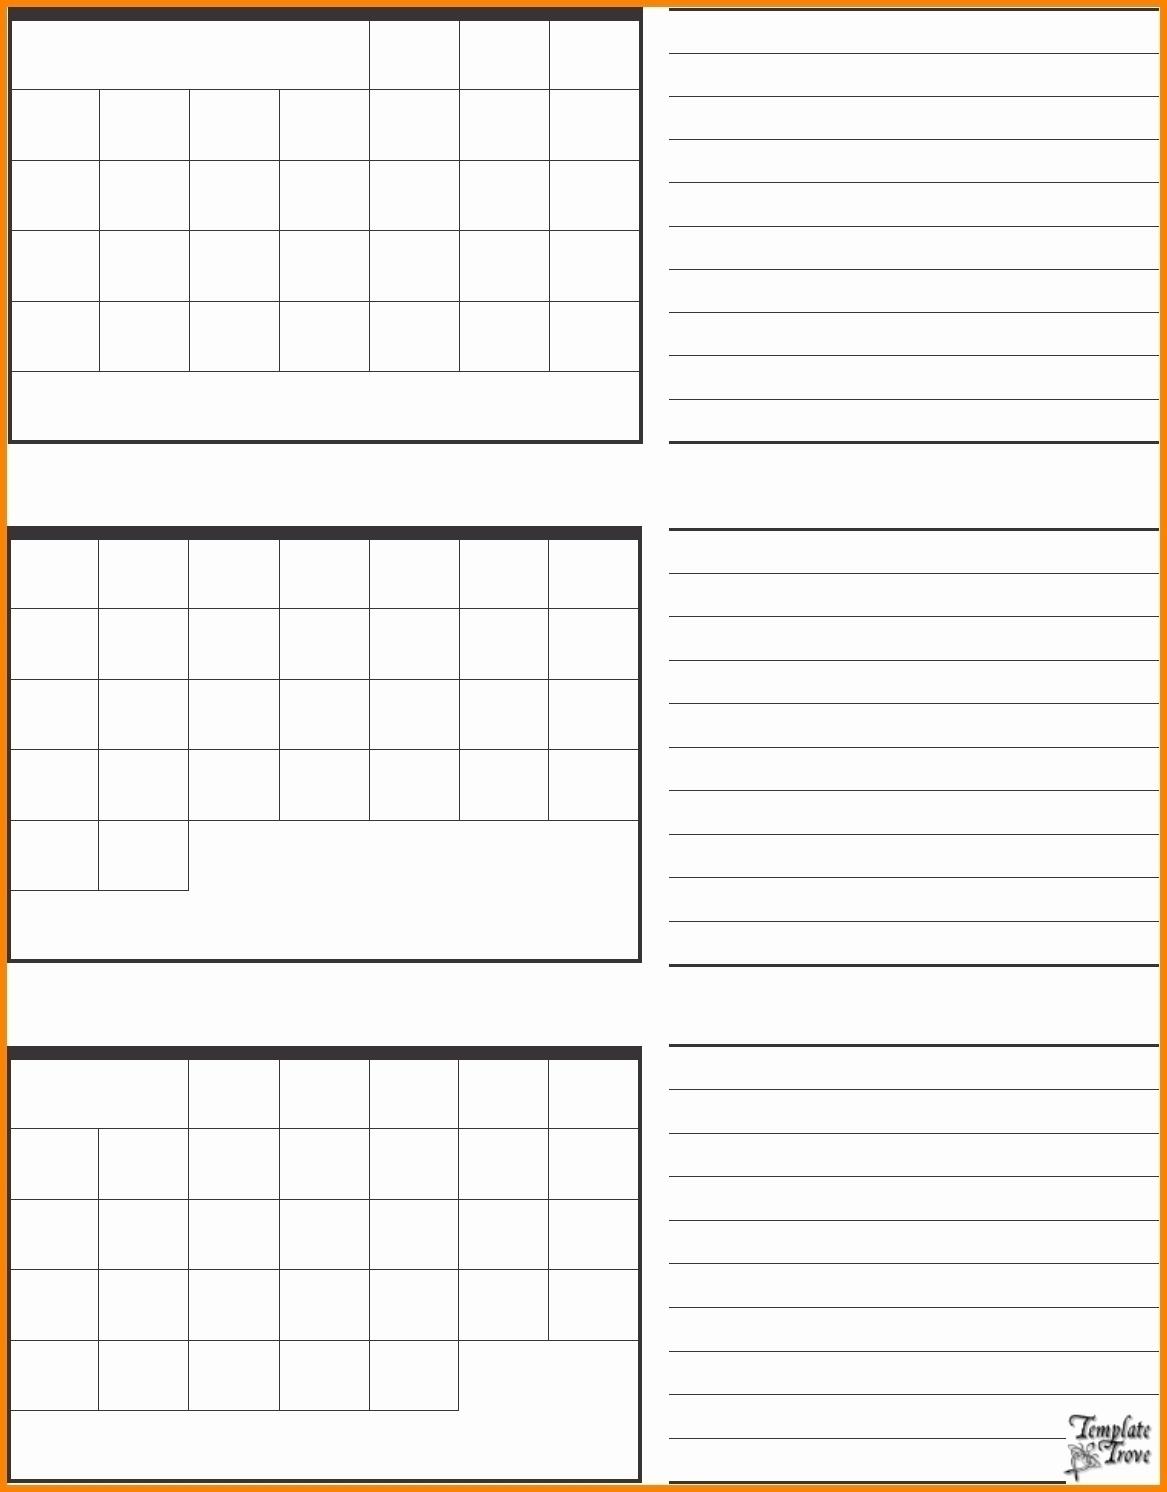 3 Month Blank Printable Calendar | Example Calendar